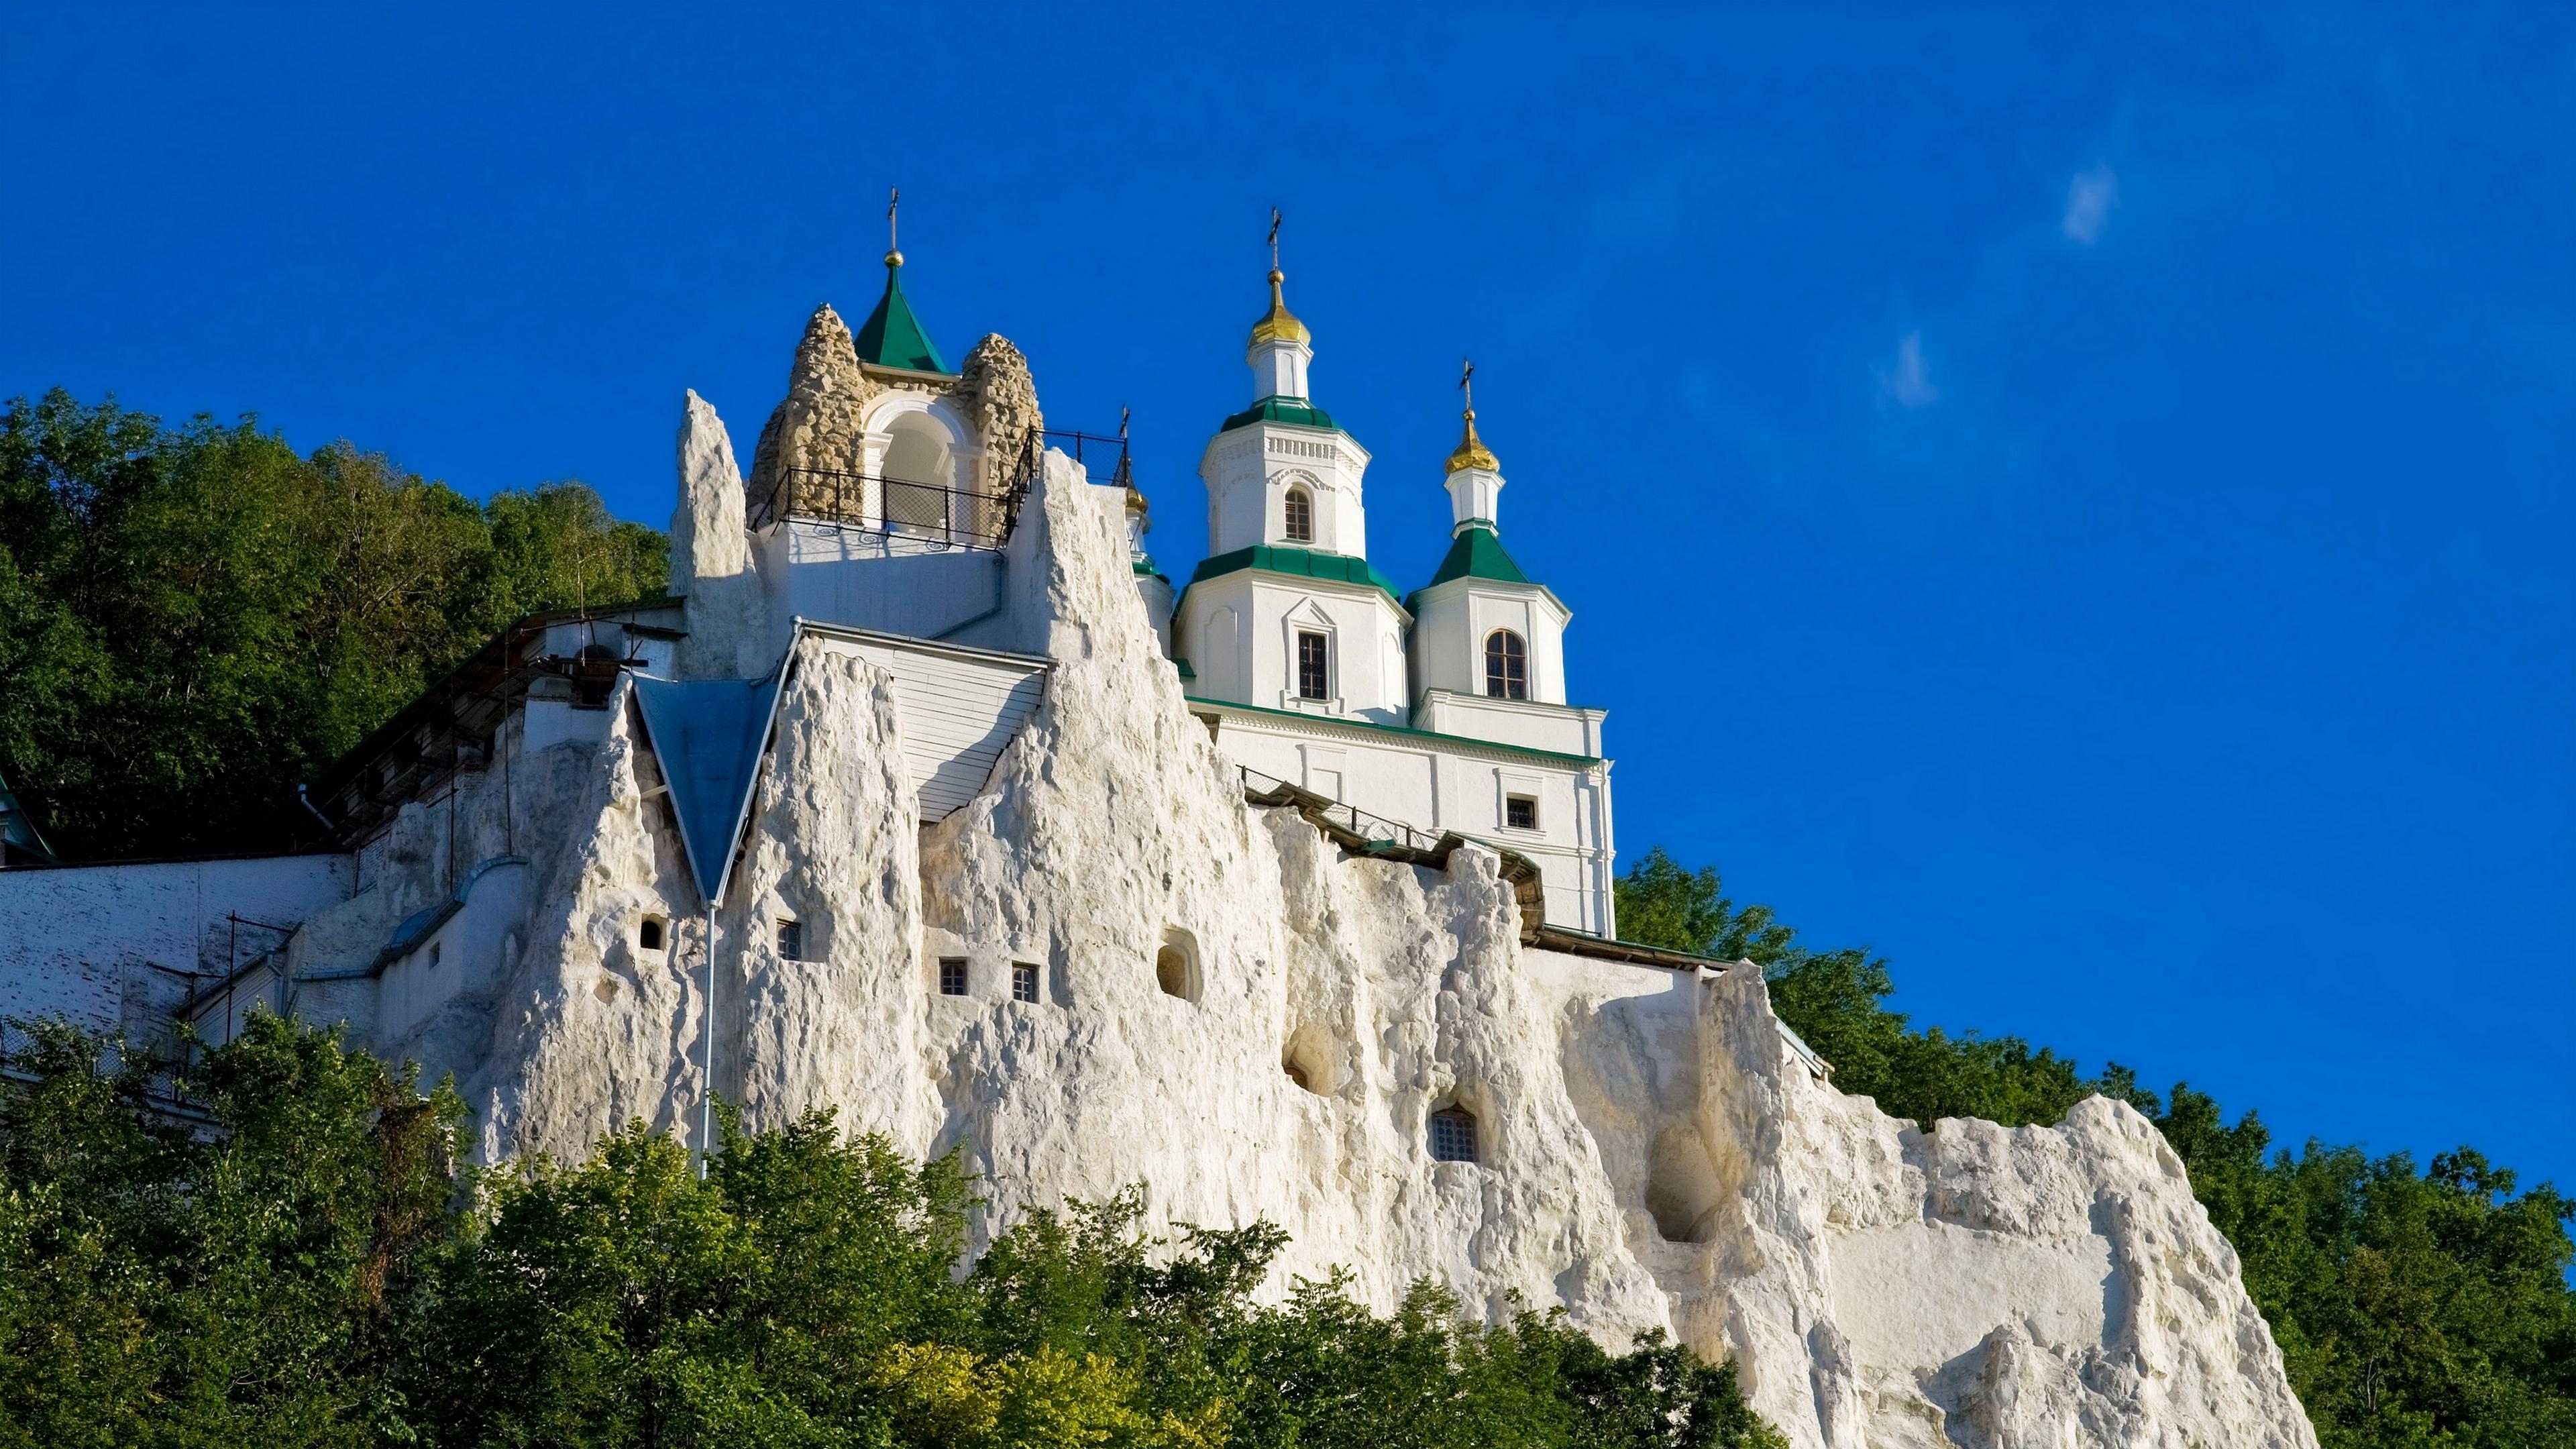 ukraine svyatogorskaya laurel cities 4k 1538067632 - ukraine, svyatogorskaya laurel, cities 4k - Ukraine, svyatogorskaya laurel, cities